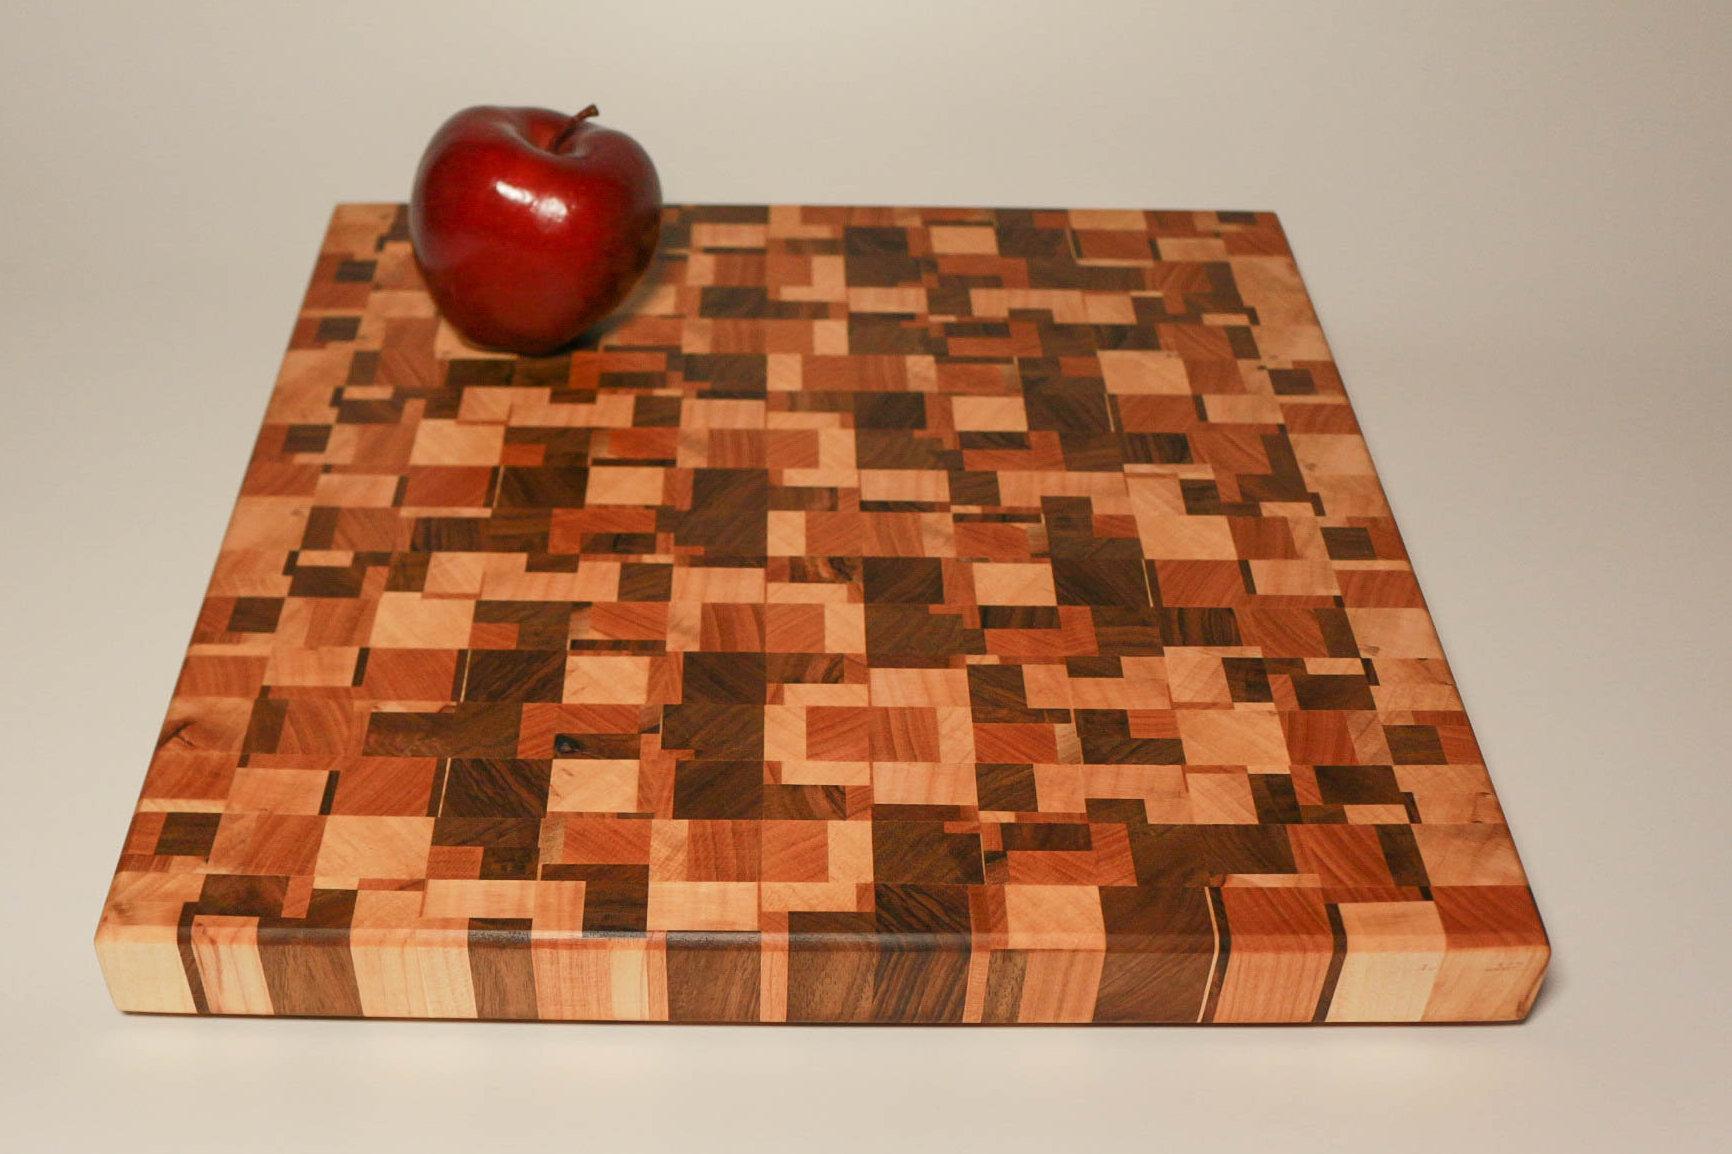 Schneidebrett aus Hirnholz im Schachbrettmuster aus dunklem und hellem Holz